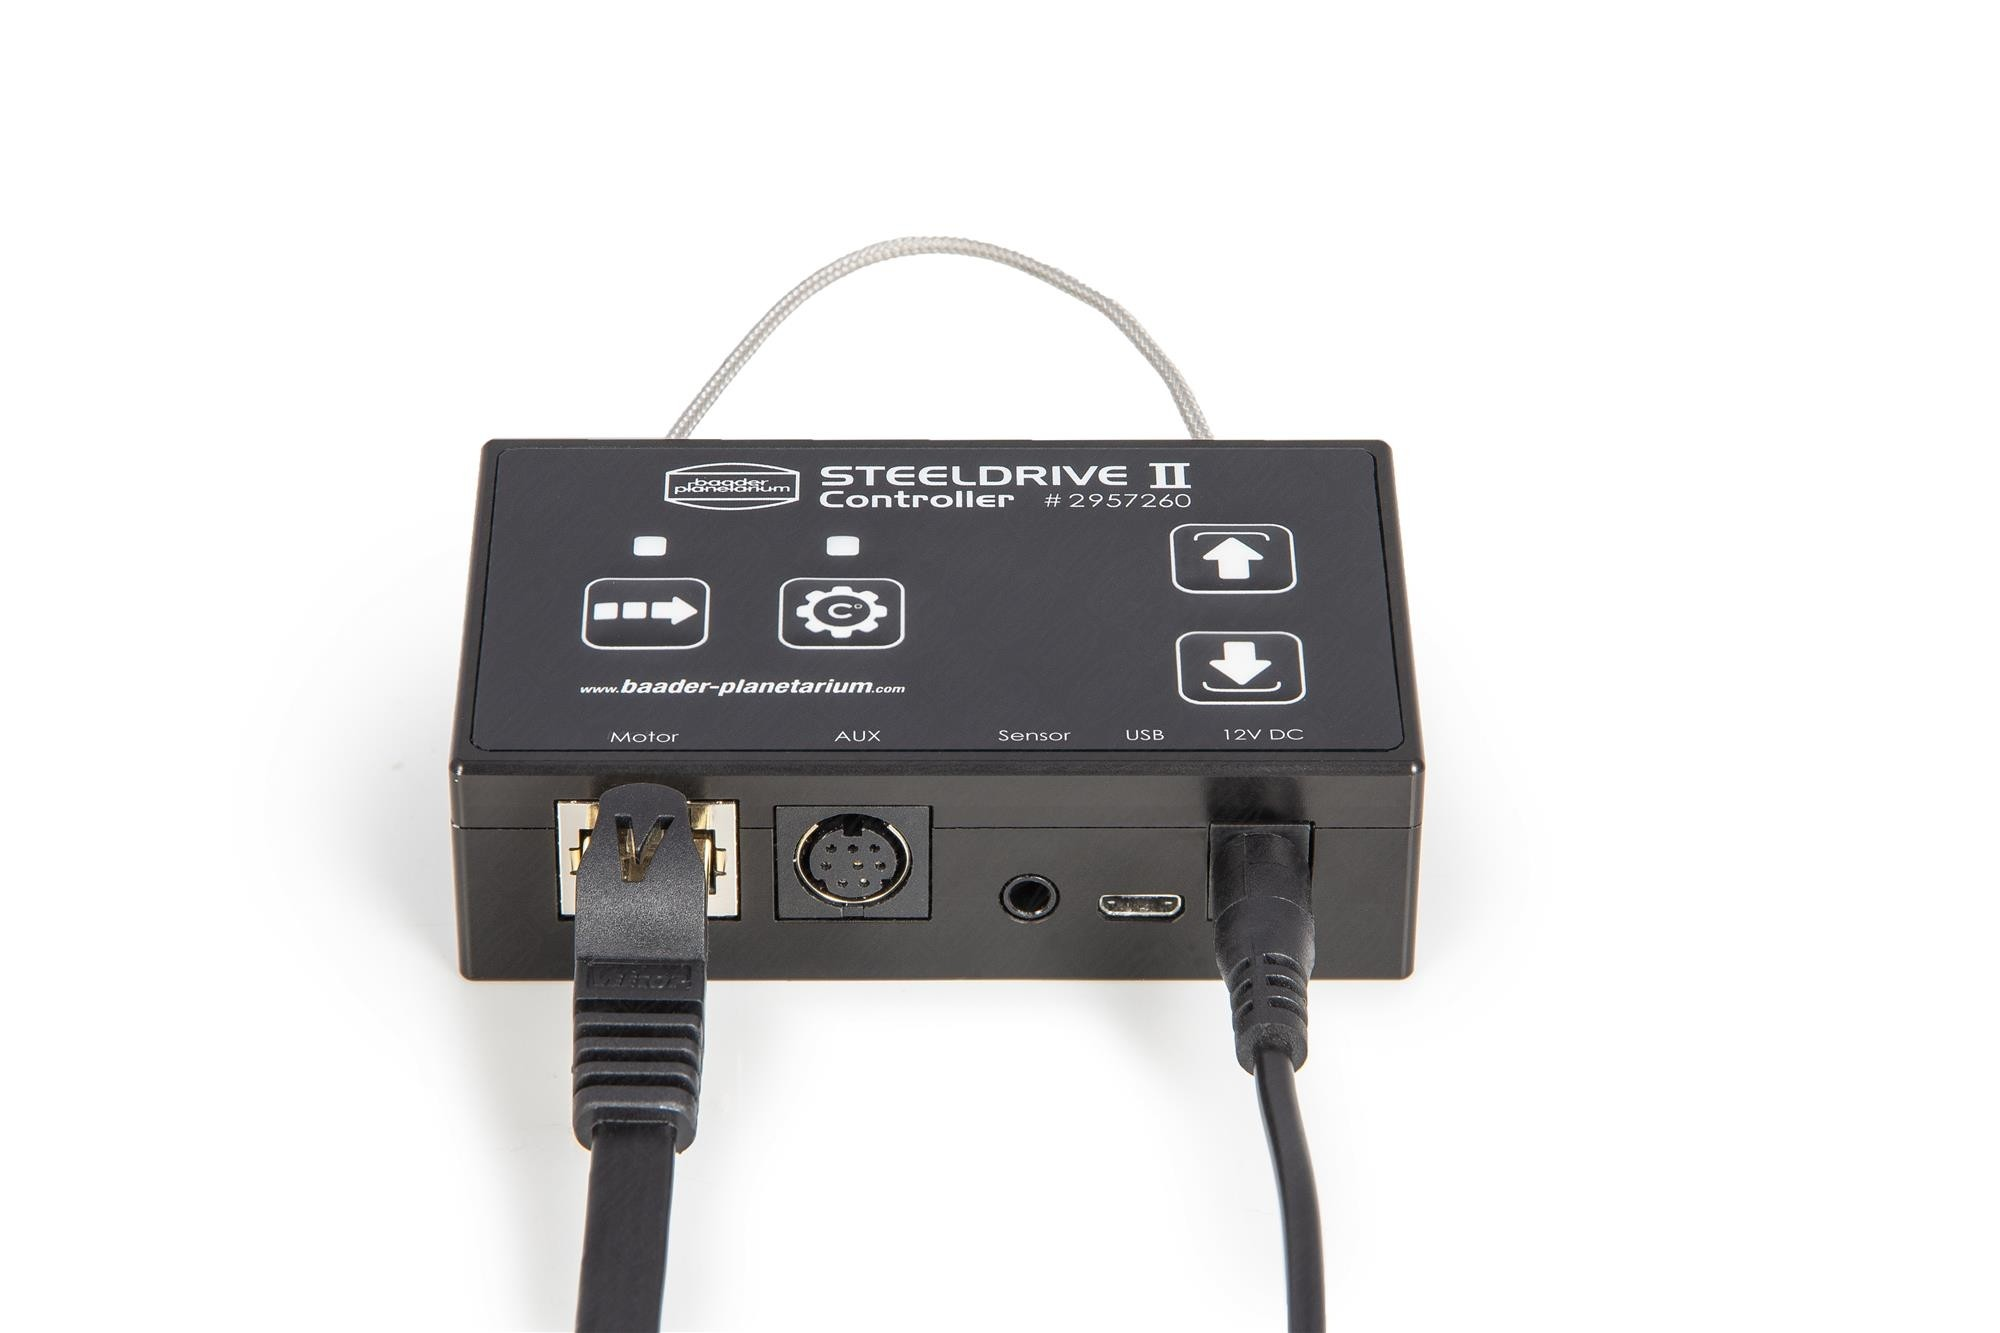 Steeldrive II Controller